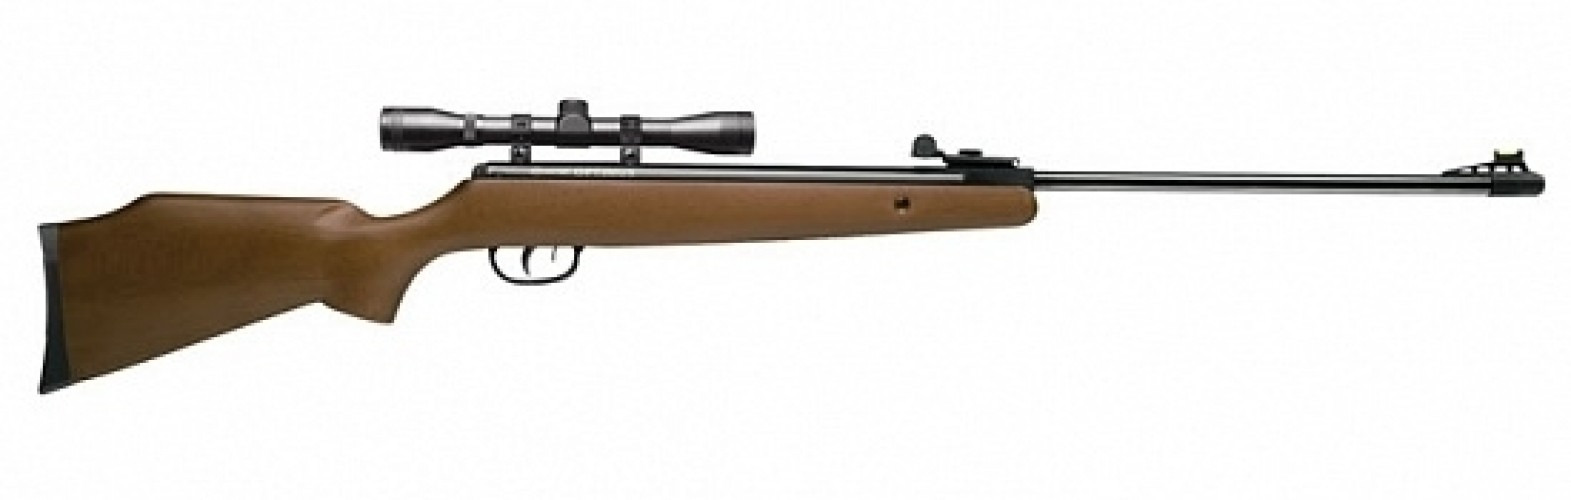 Пневматическая винтовка Crosman Optimus R8-CO1K77x